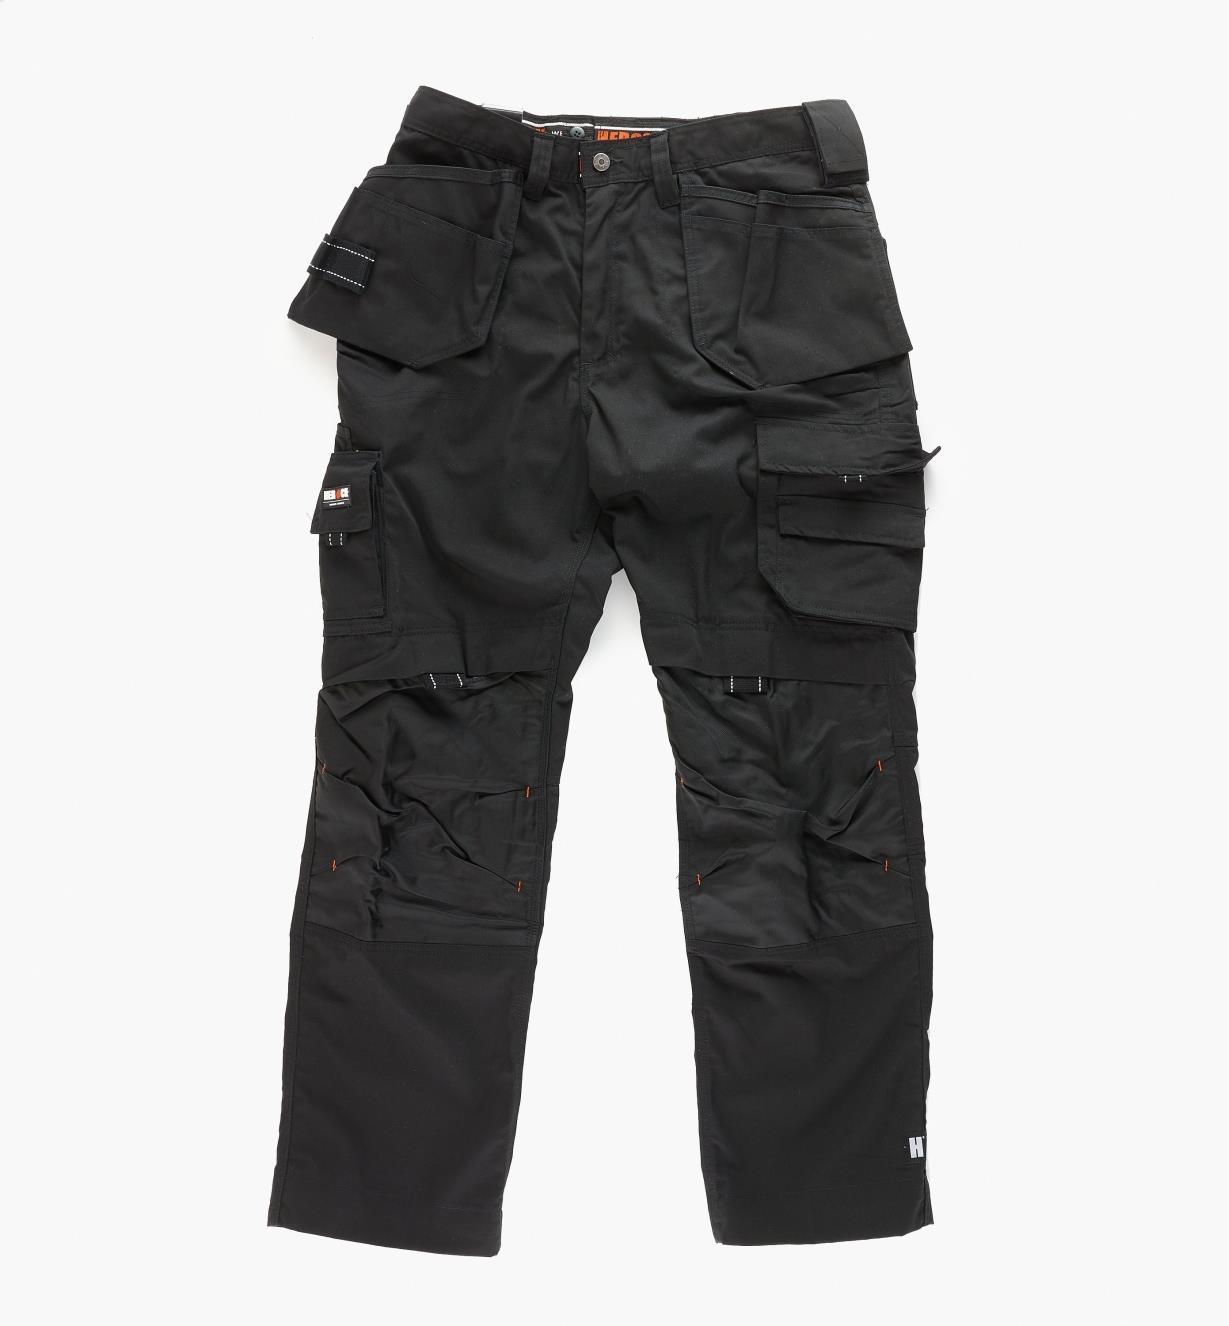 Black Medium-Weight Pants